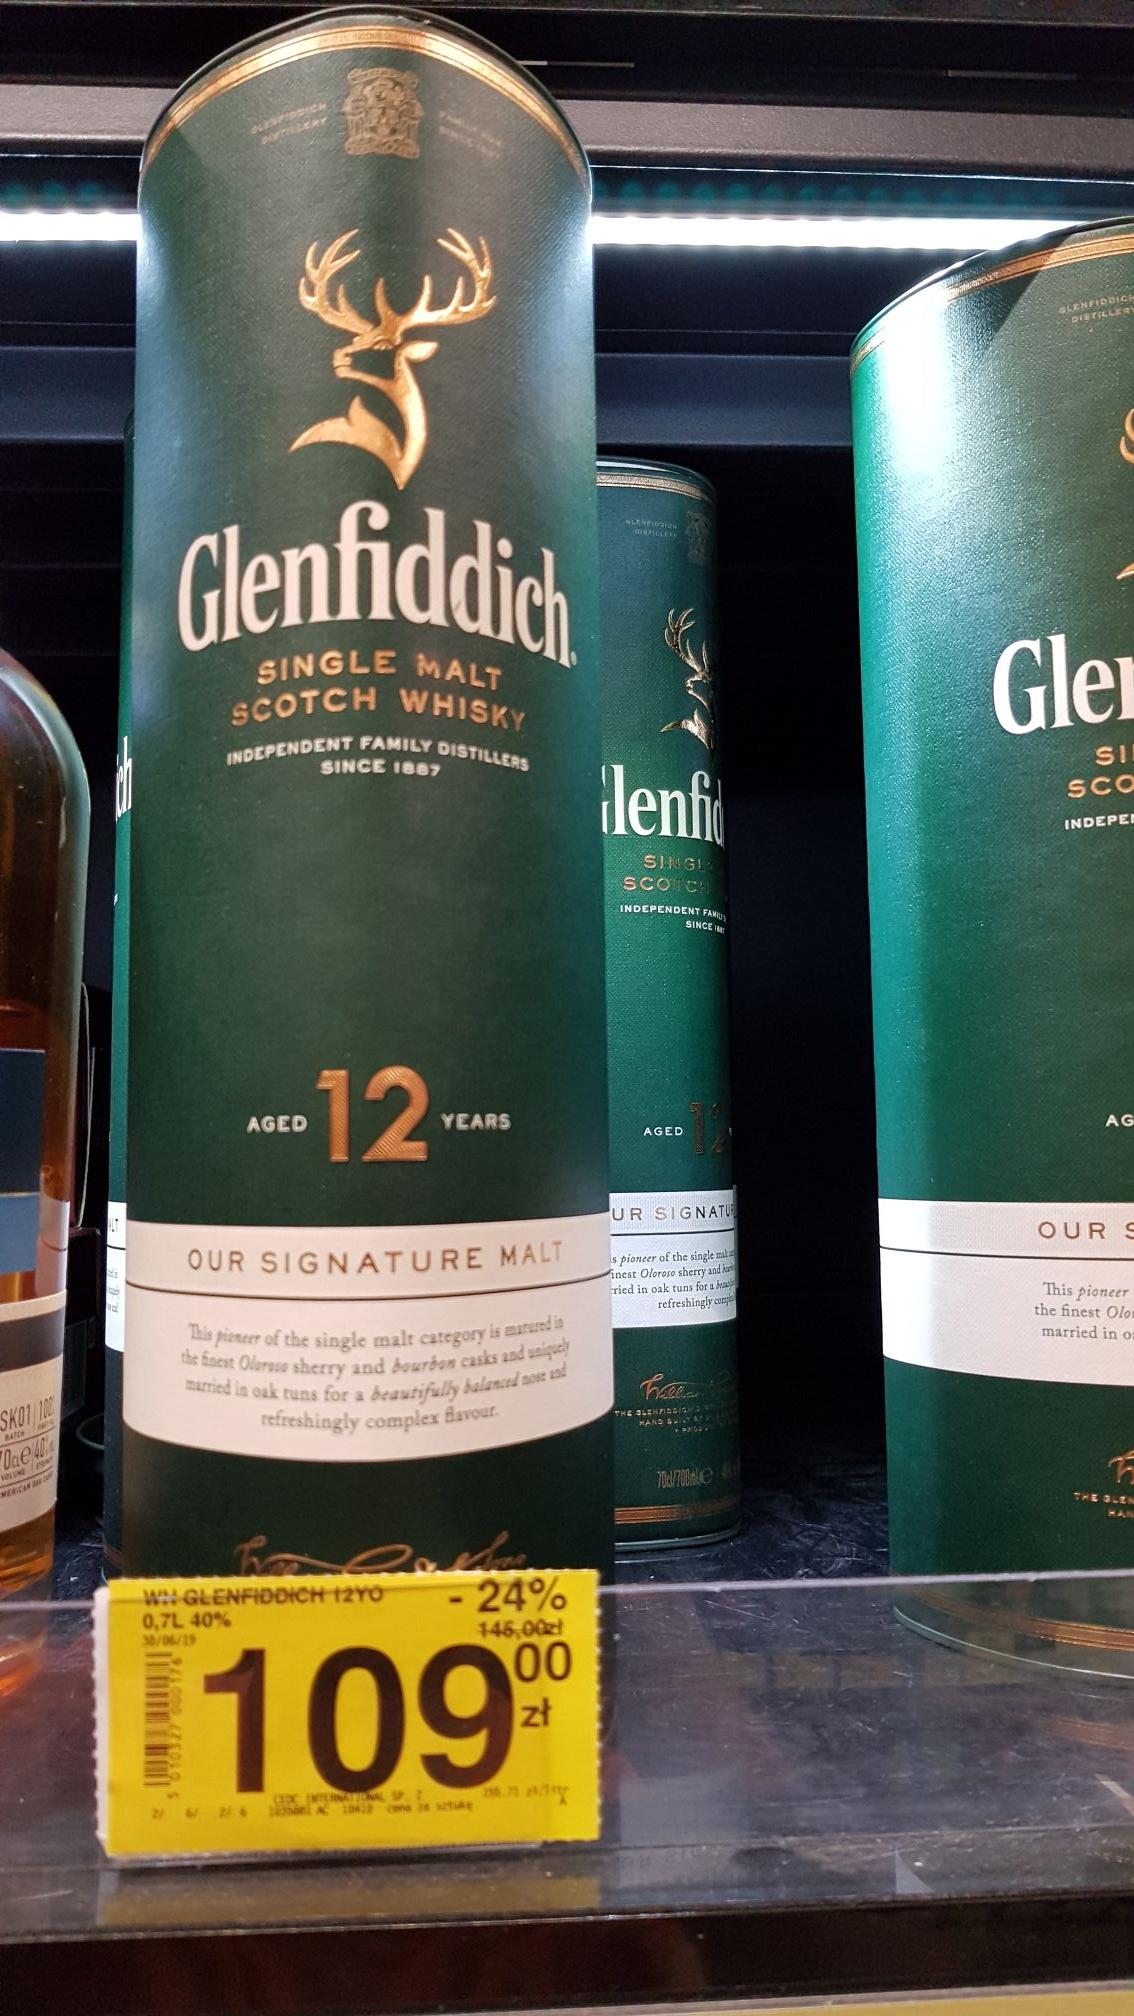 Whisky Glenfiddich 12YO Single Malt